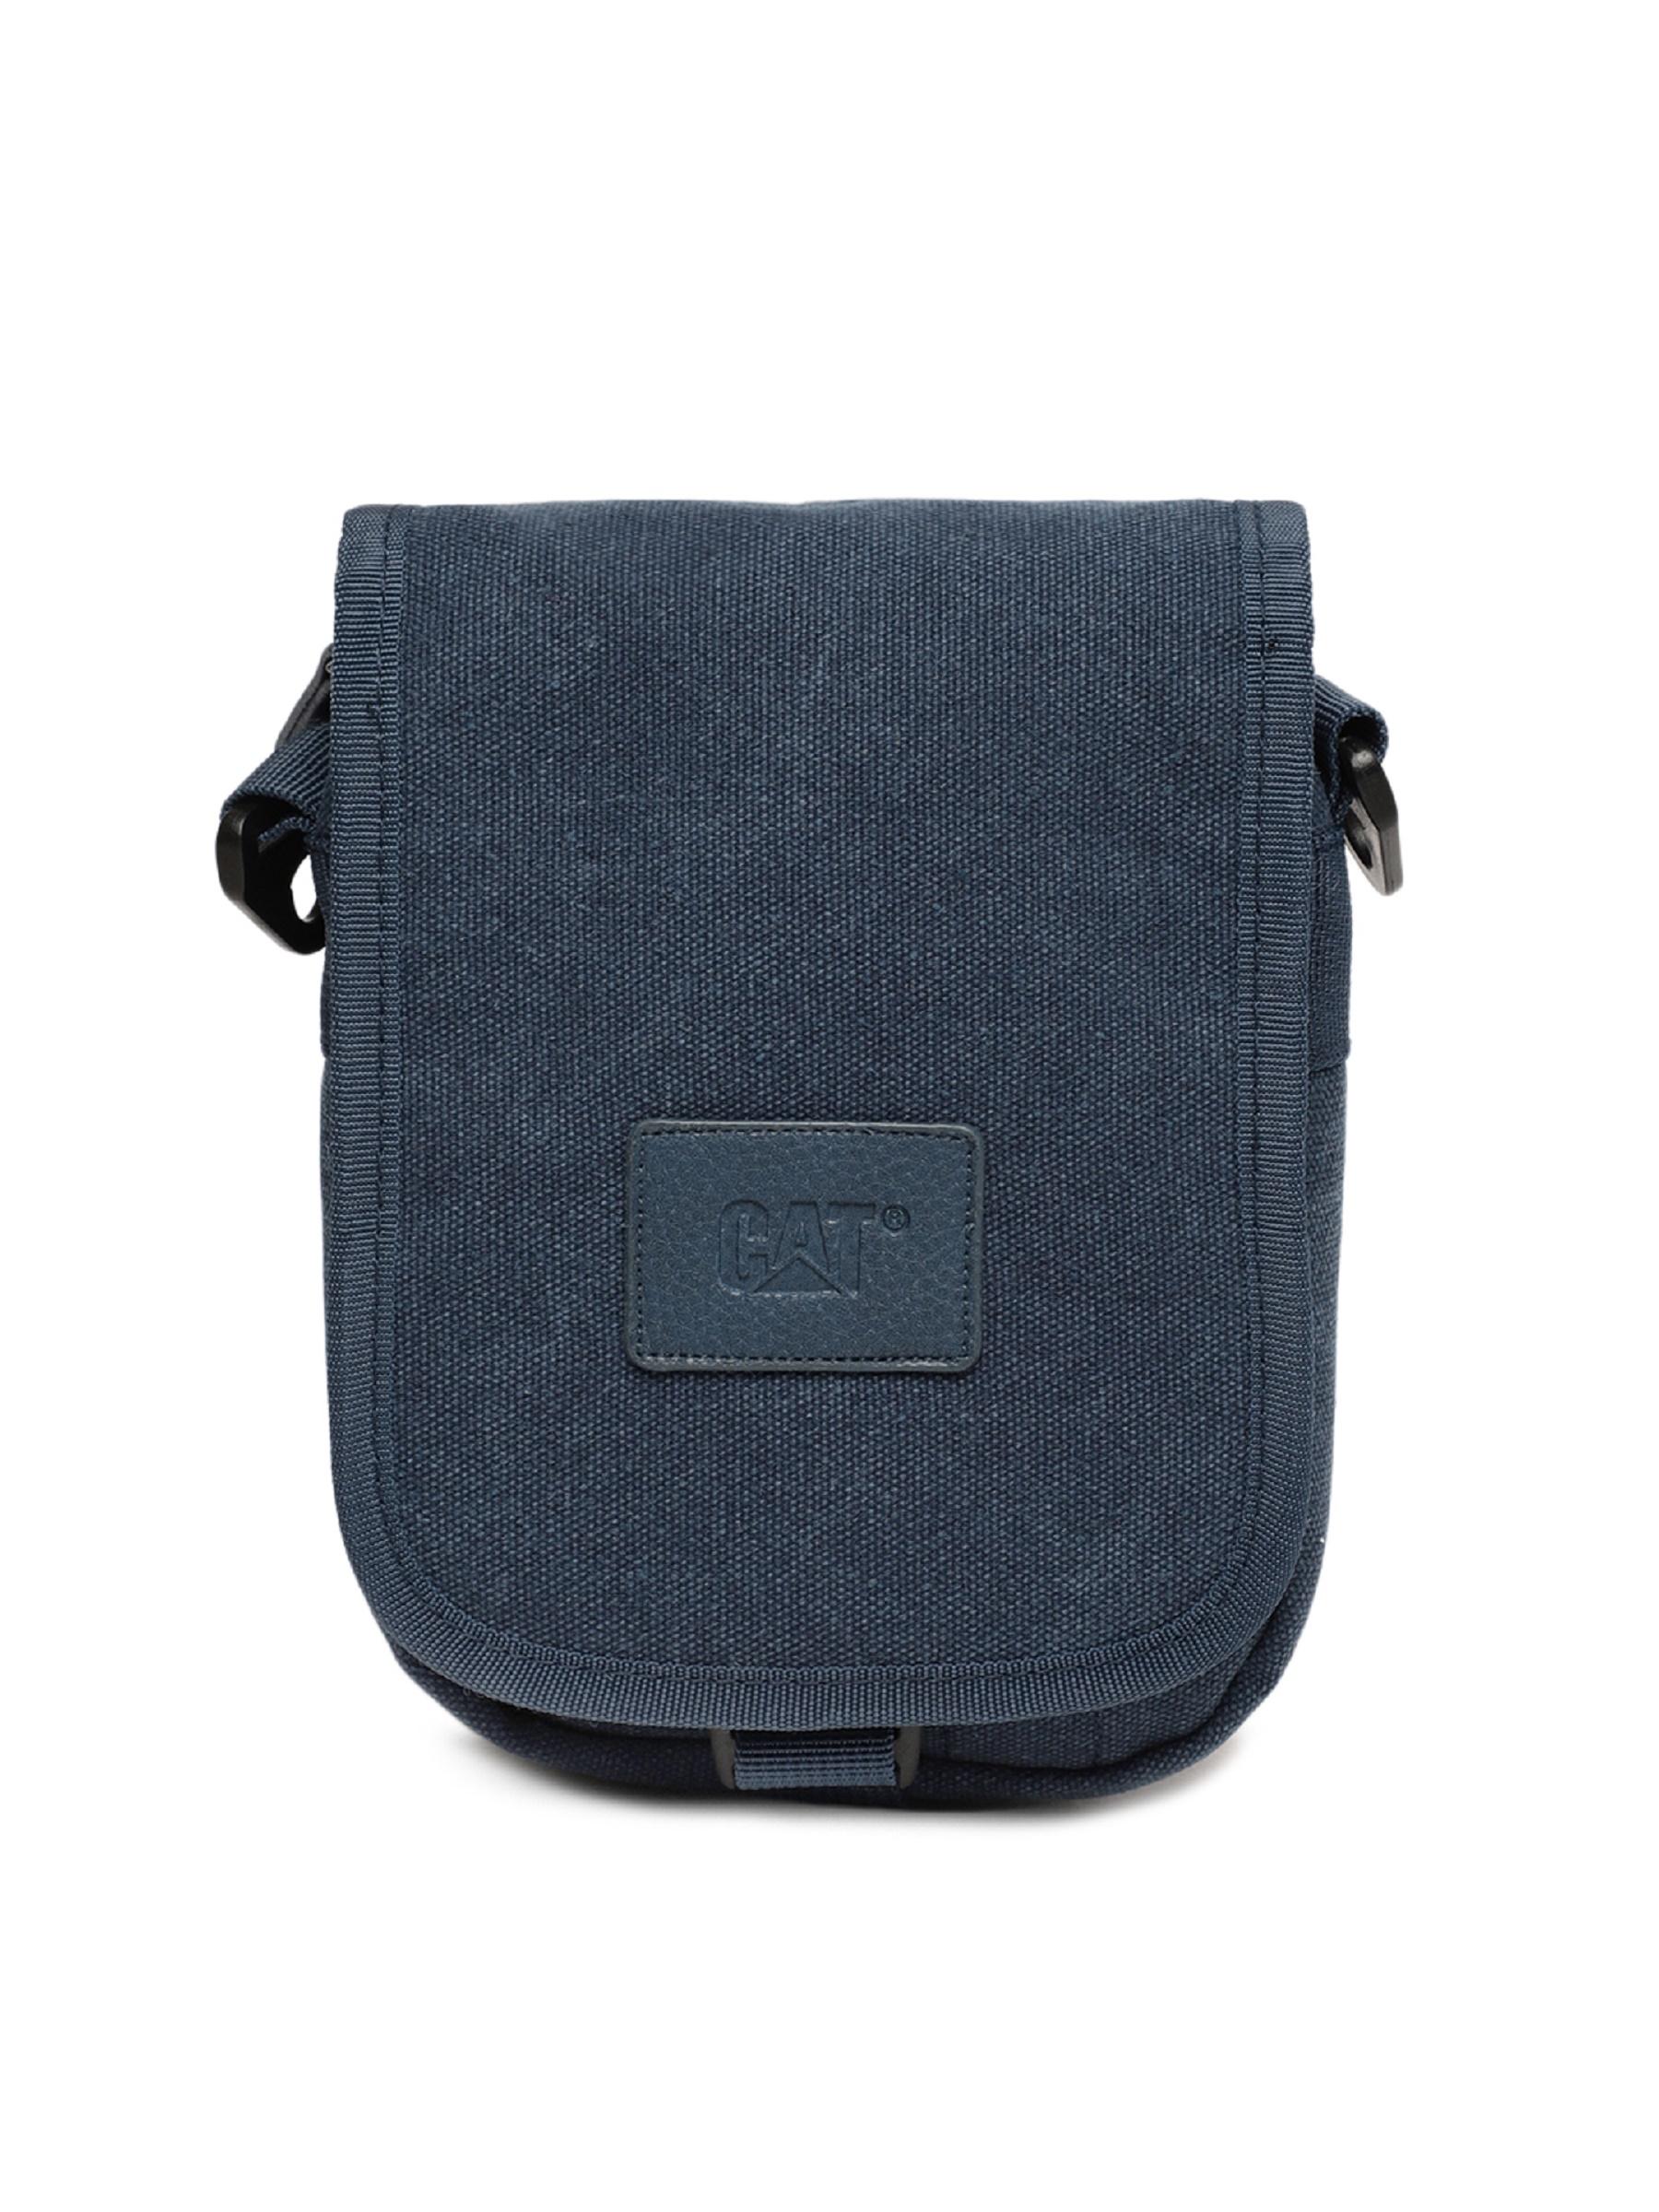 5a1ab8c55d CAT Unisex Utility bag Earthline 1.5 Ltrs Blue Casual Solid Messenger Bag